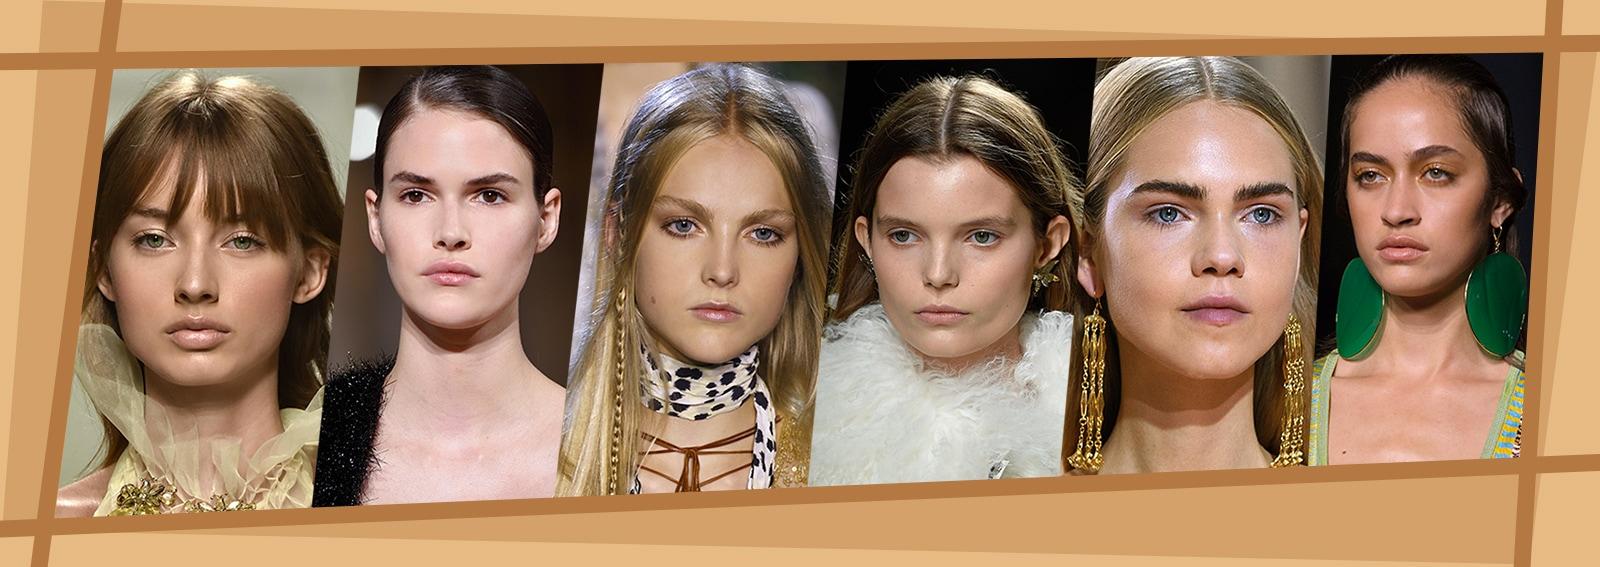 Glow_Make-up_Primavera_2017_desktop